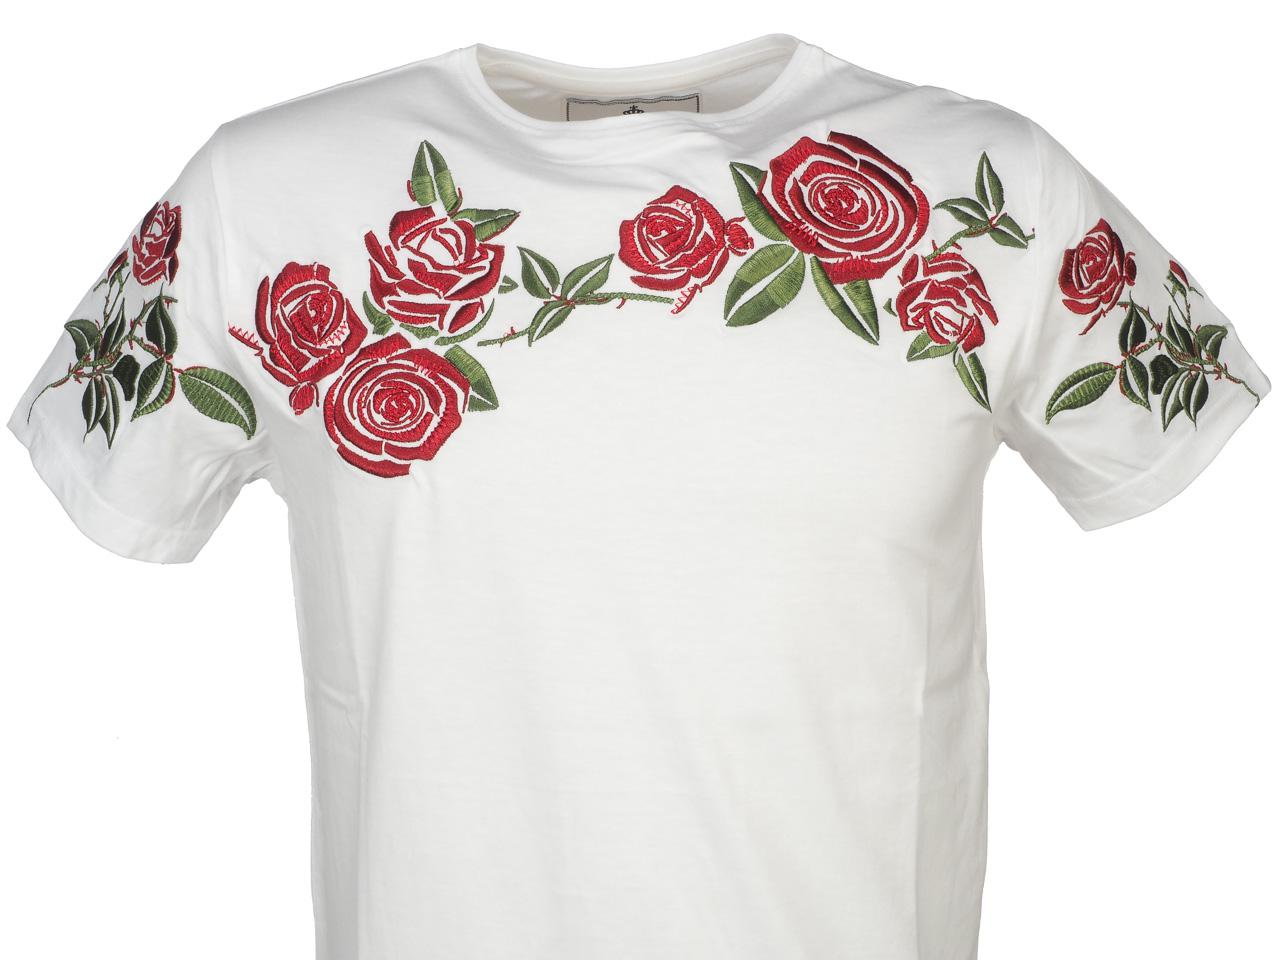 Short-Hite-Couture-Madiner-White-Mc-Tee-White-11526-New thumbnail 2